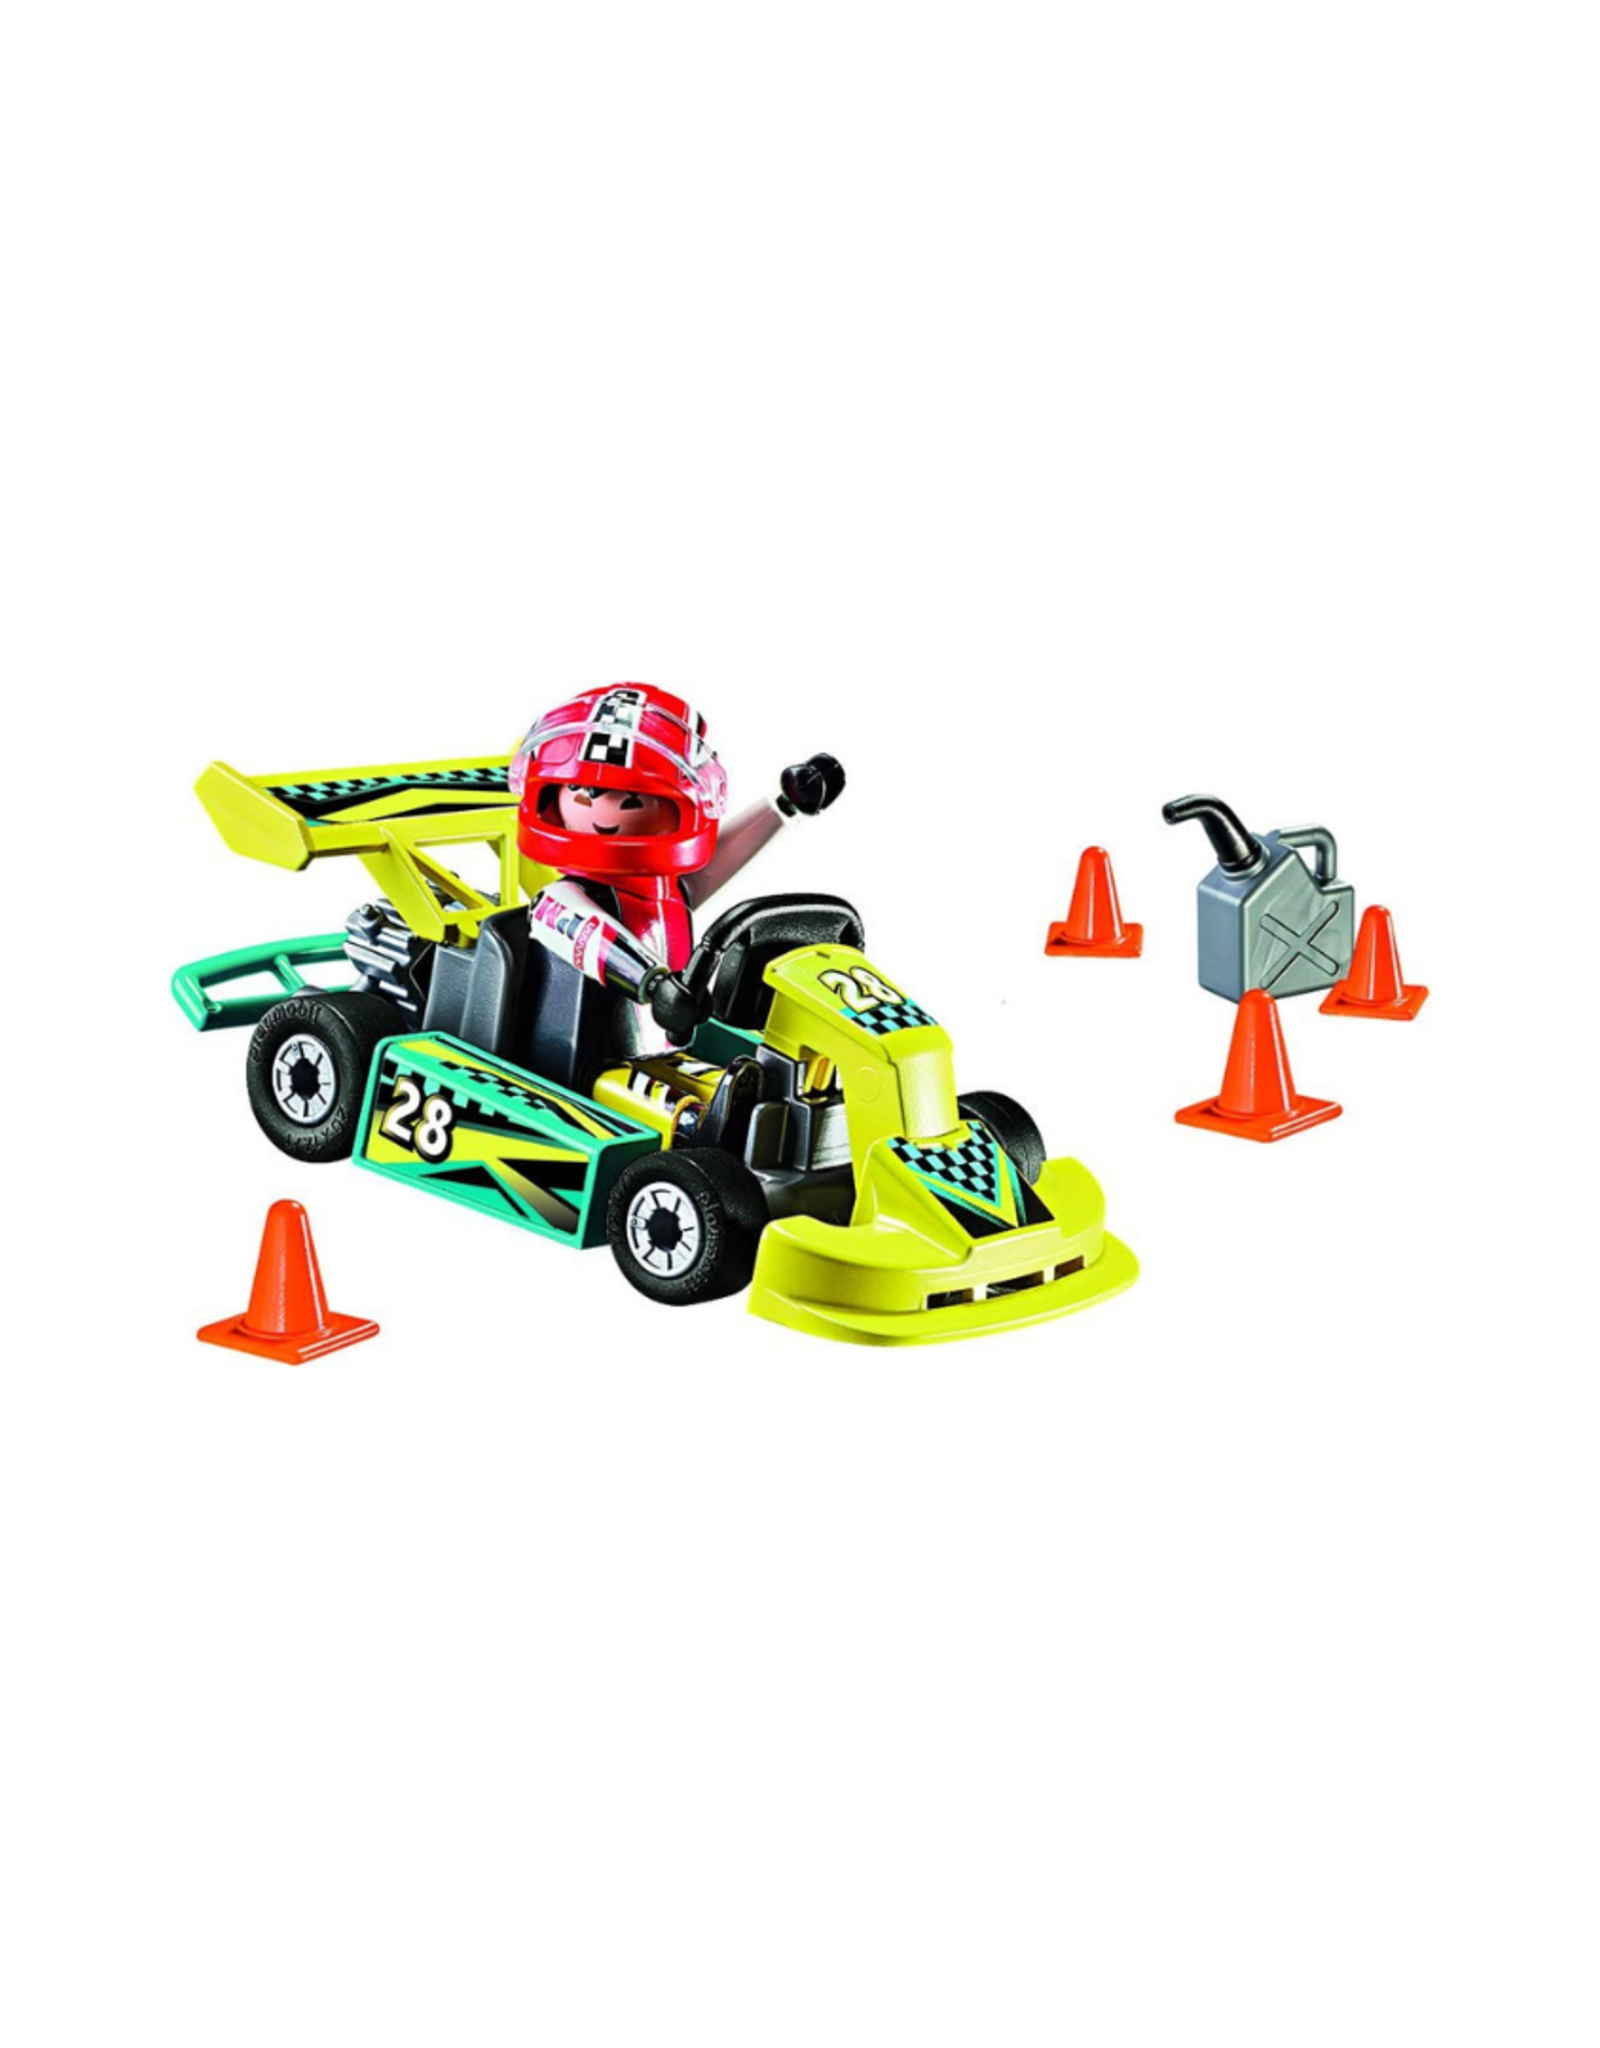 Playmobil PM - Go-Kart Racer Carry Case